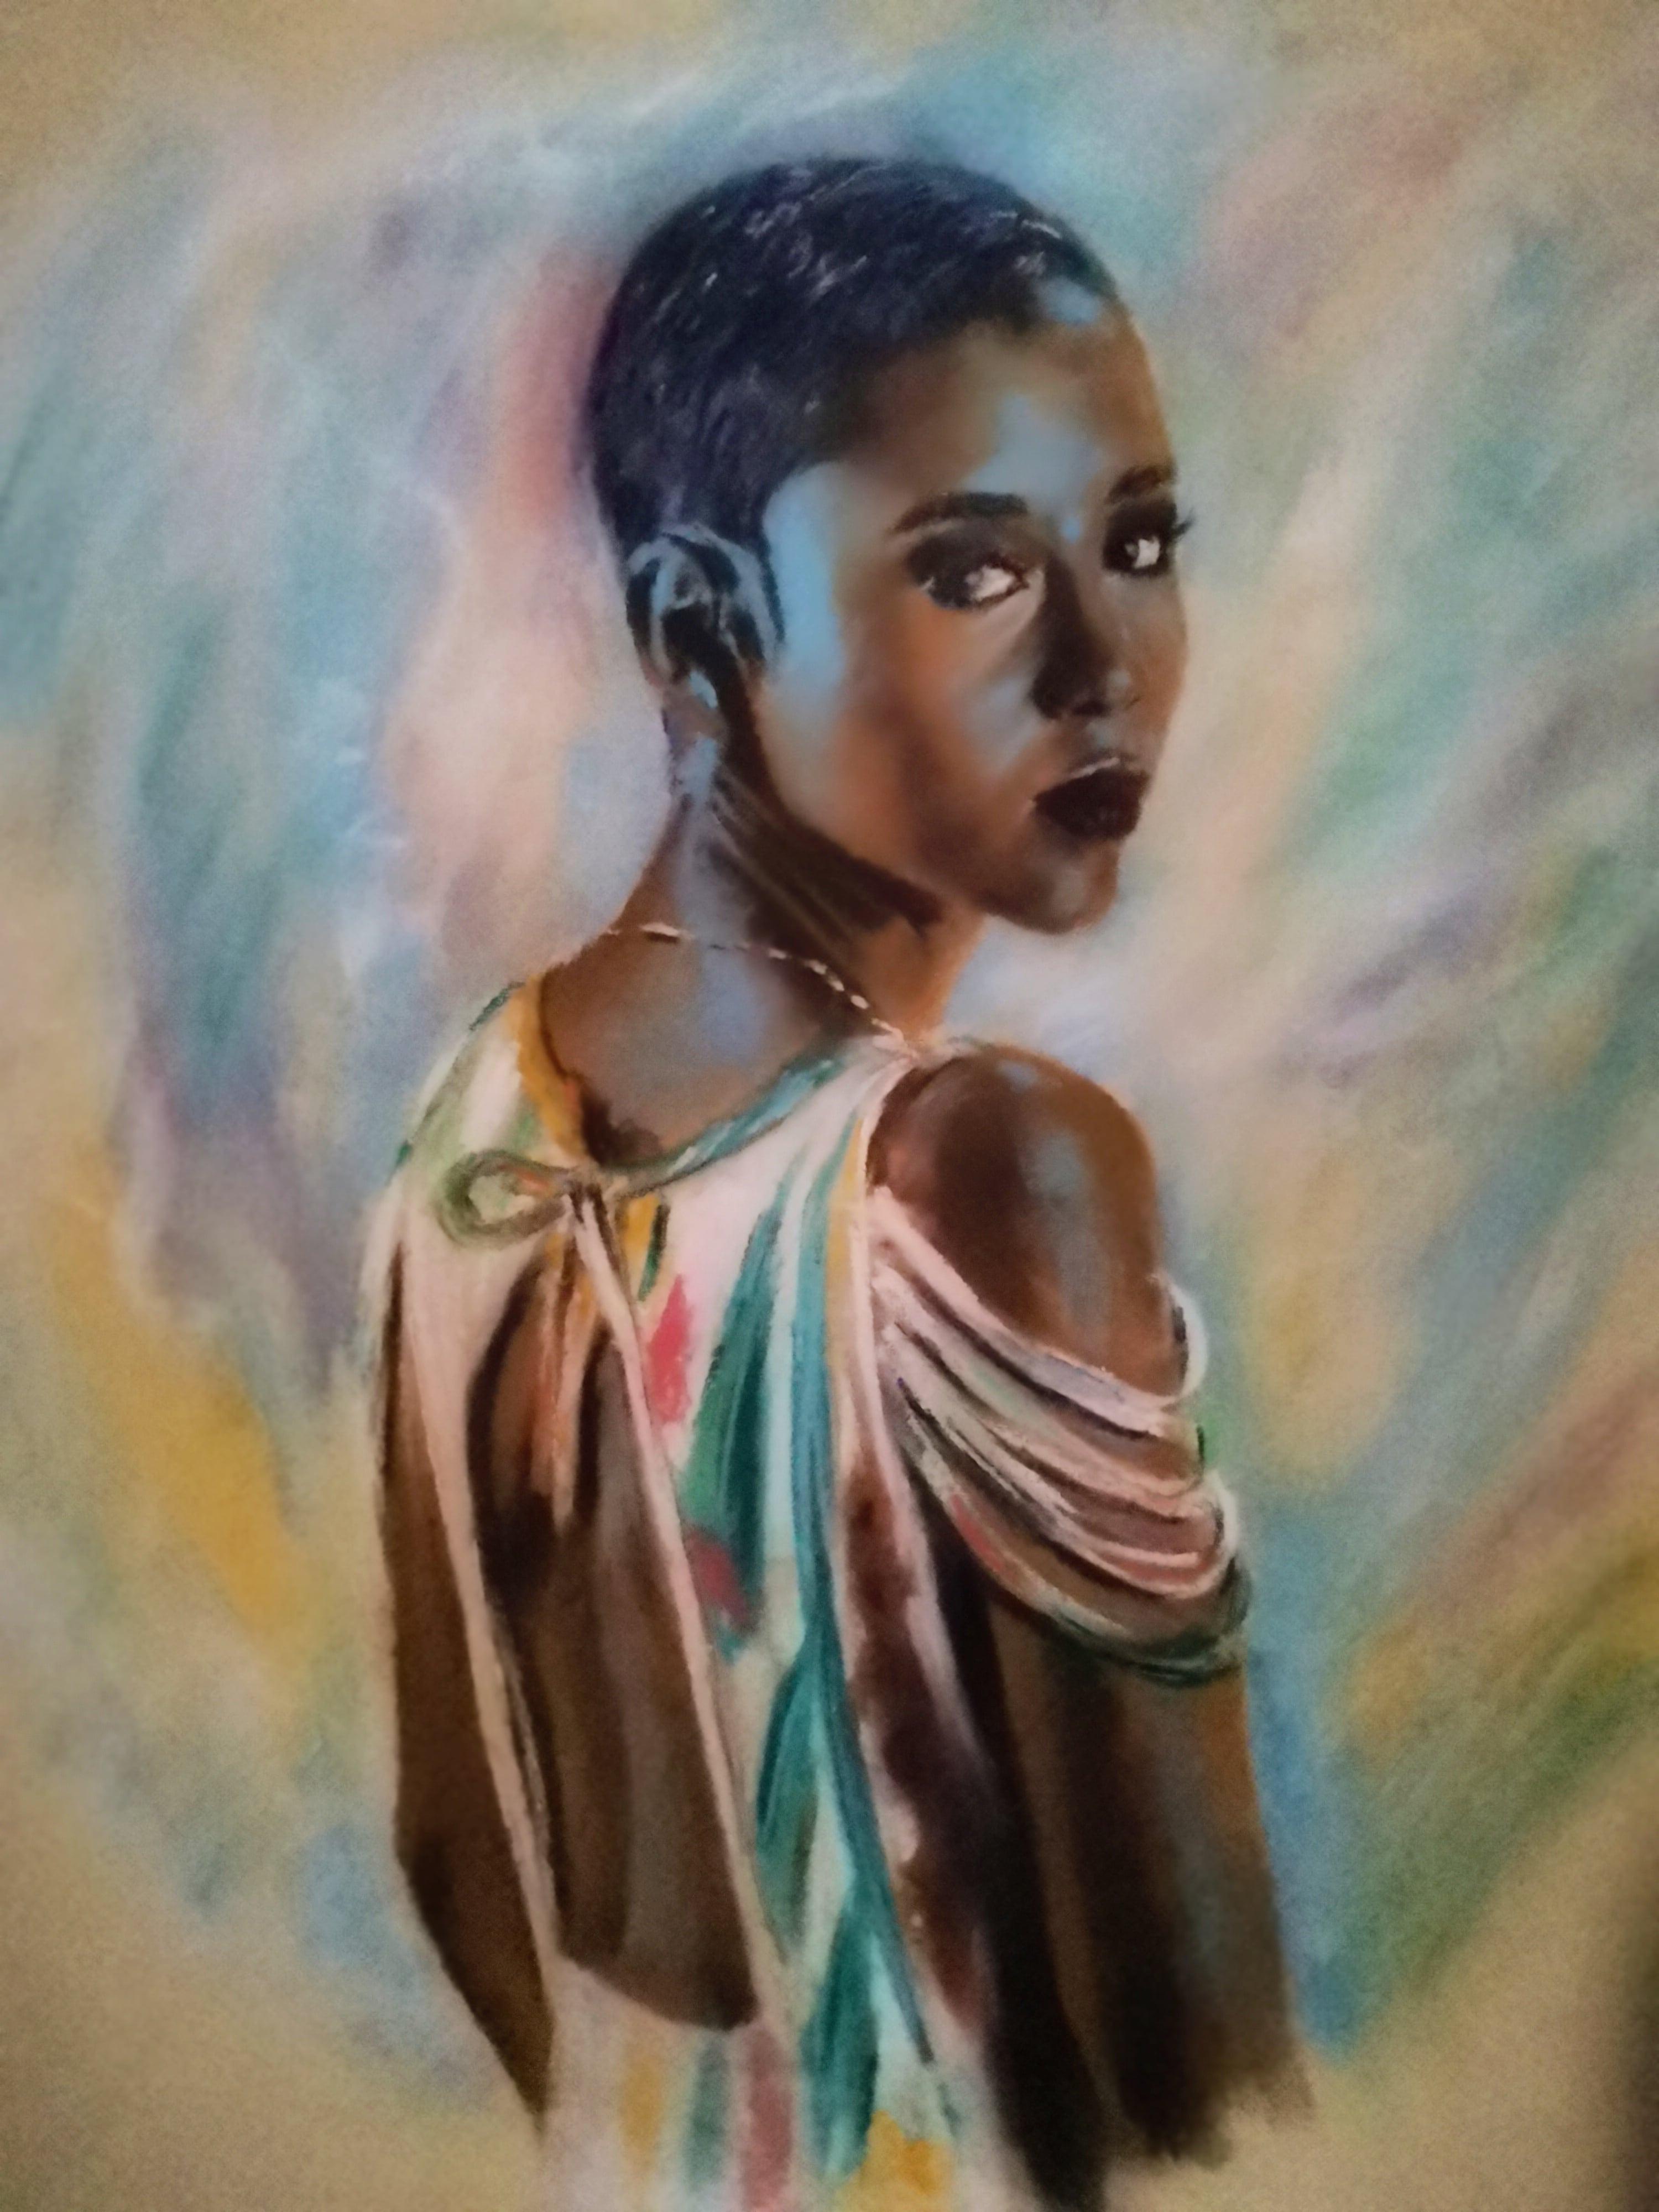 Original artwork by independent artist